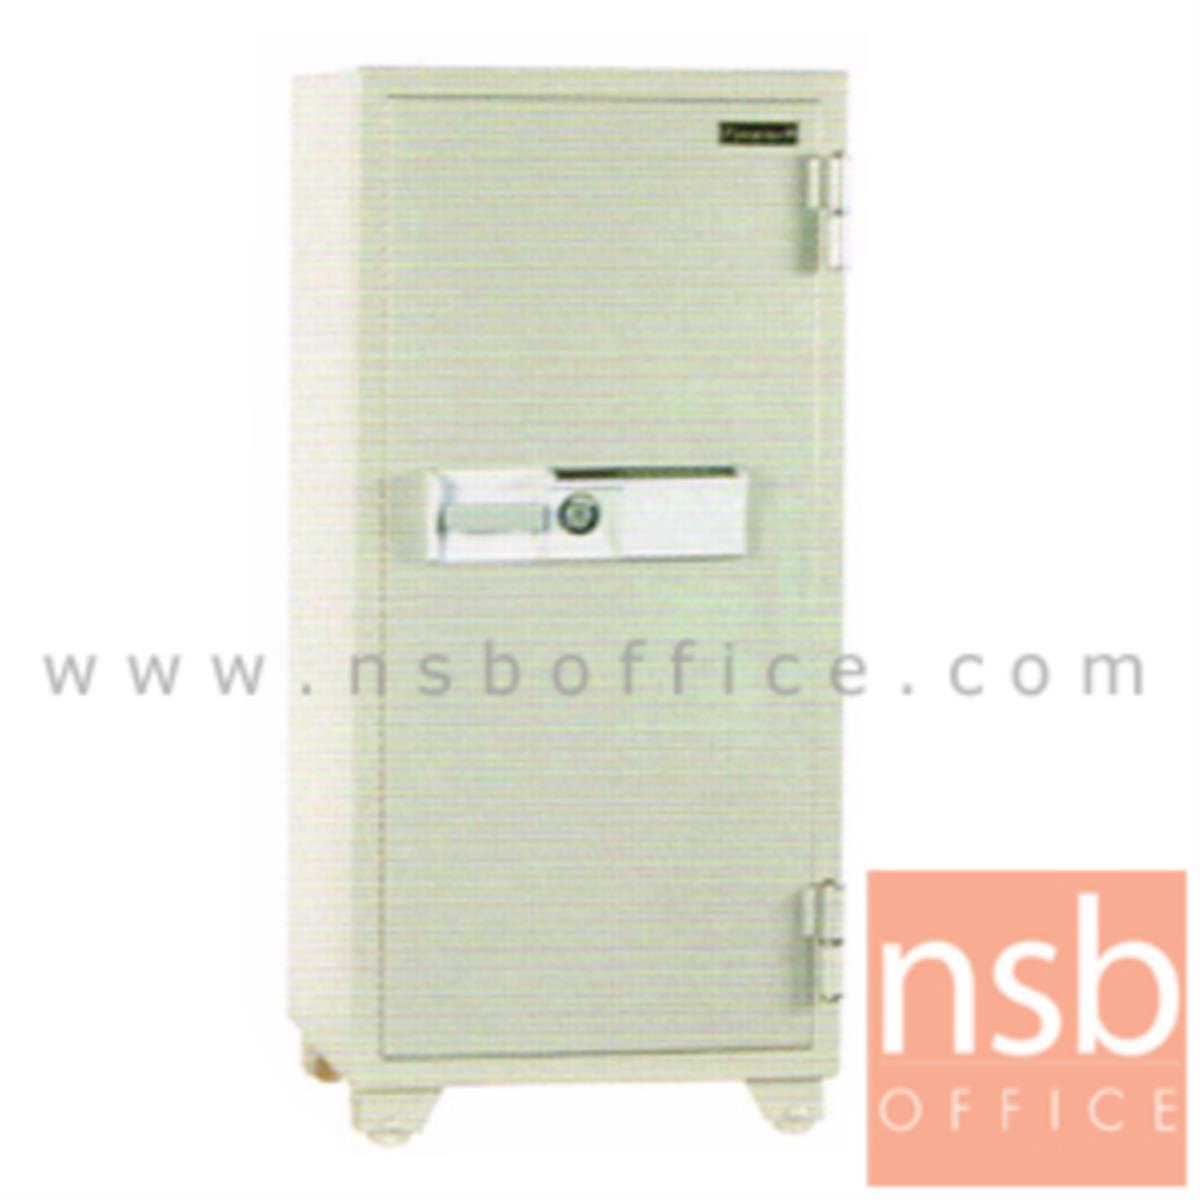 F05A059:ตู้เซฟดิจิตอล 250 กก.  รุ่น PRESIDENT-SB50D2  มี 1 กุญแจ 1 รหัส (รหัสใช้กดหน้าตู้)